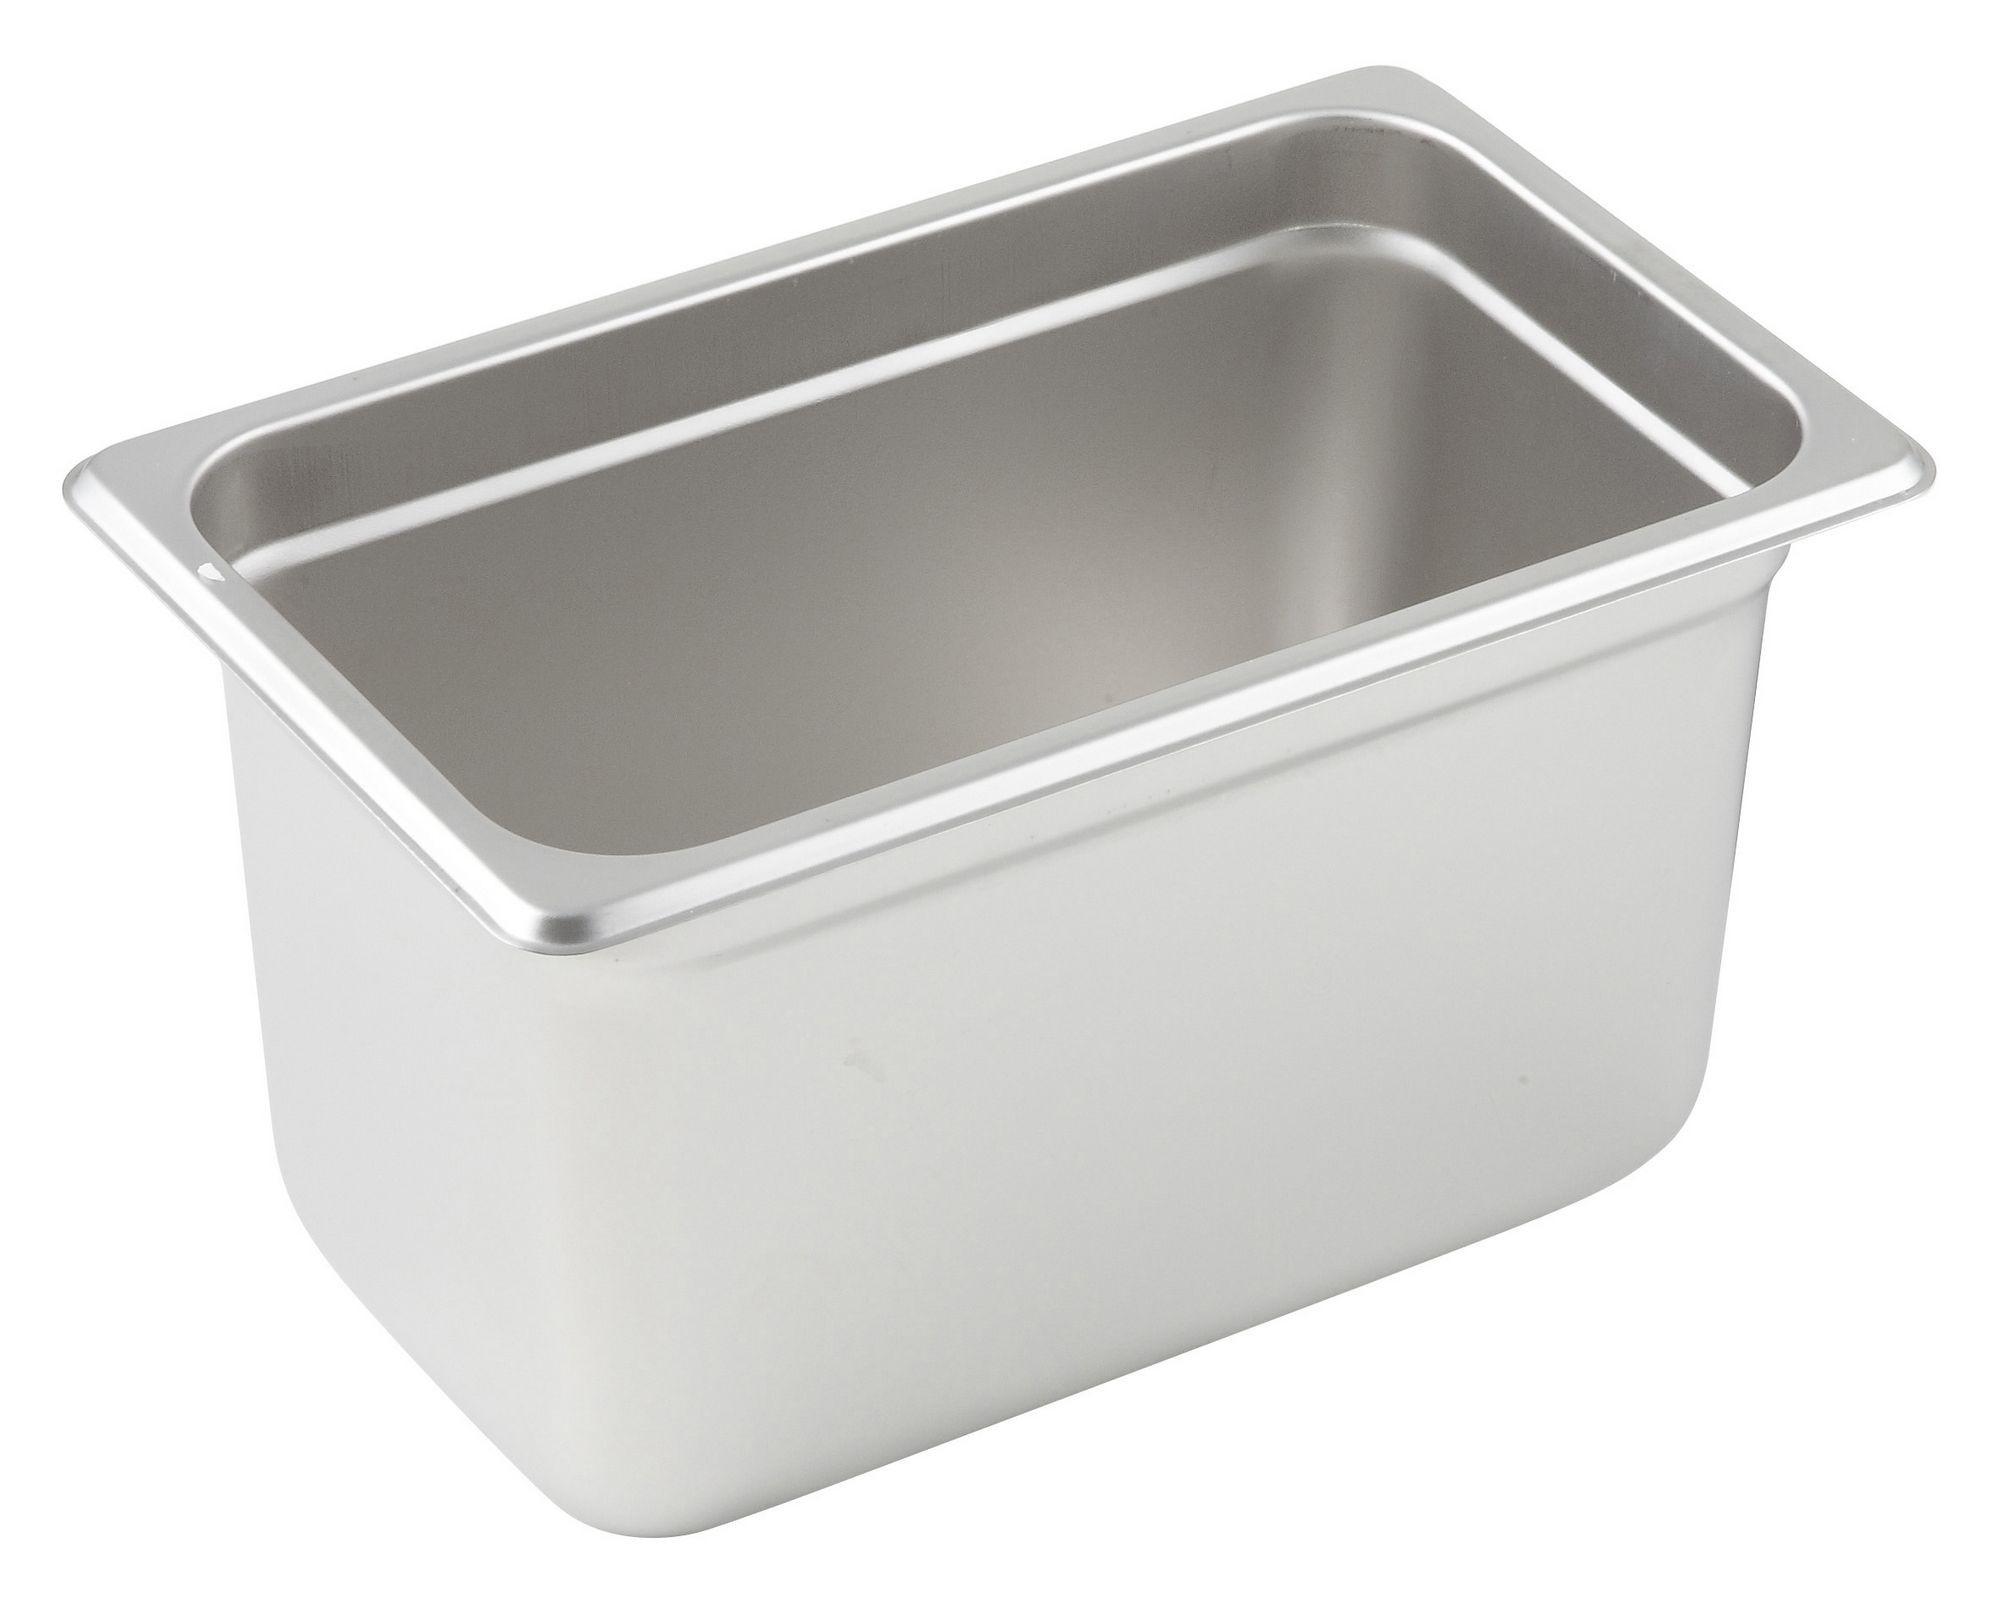 "Winco SPJP-406 1/4 Size Anti-Jam 23 Gauge Steam Table Pan 6"" Deep"